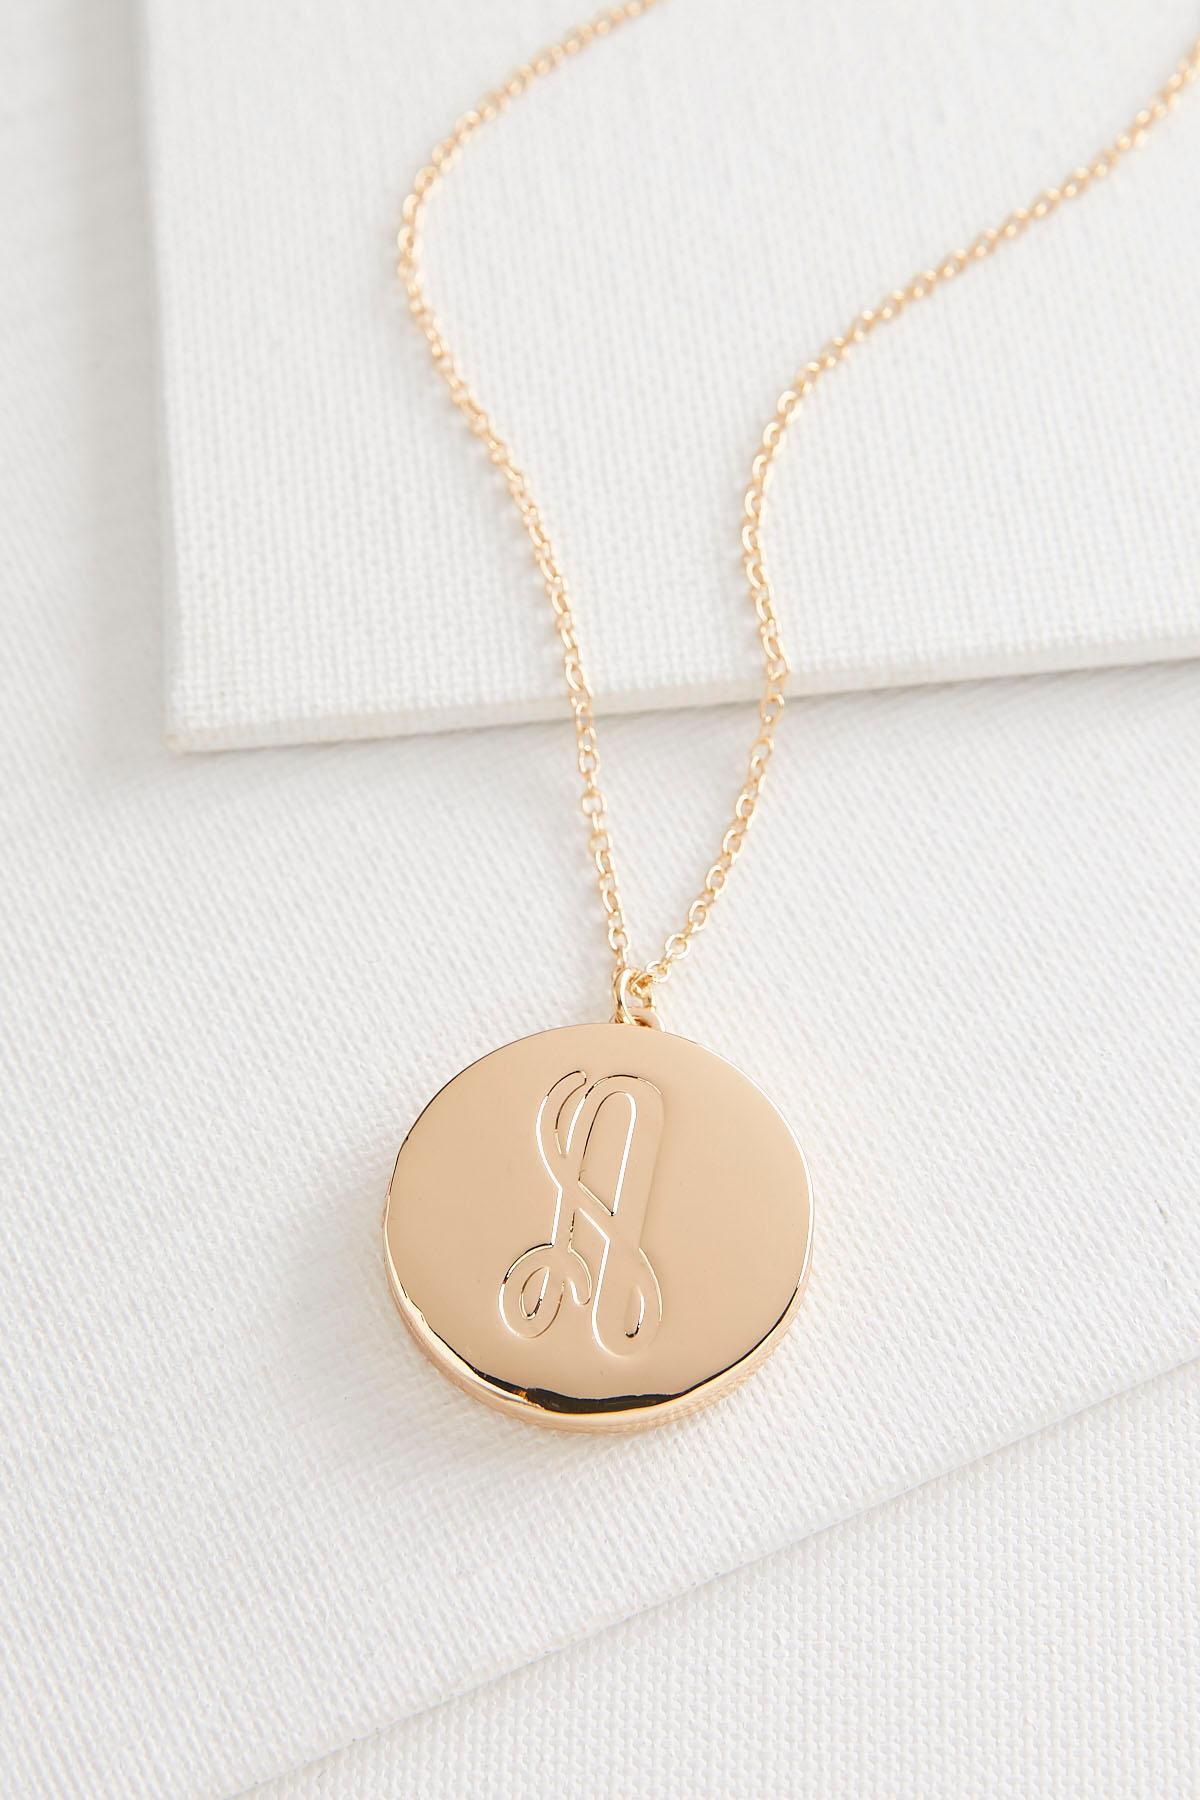 A Monogram Locket Pendant Necklace